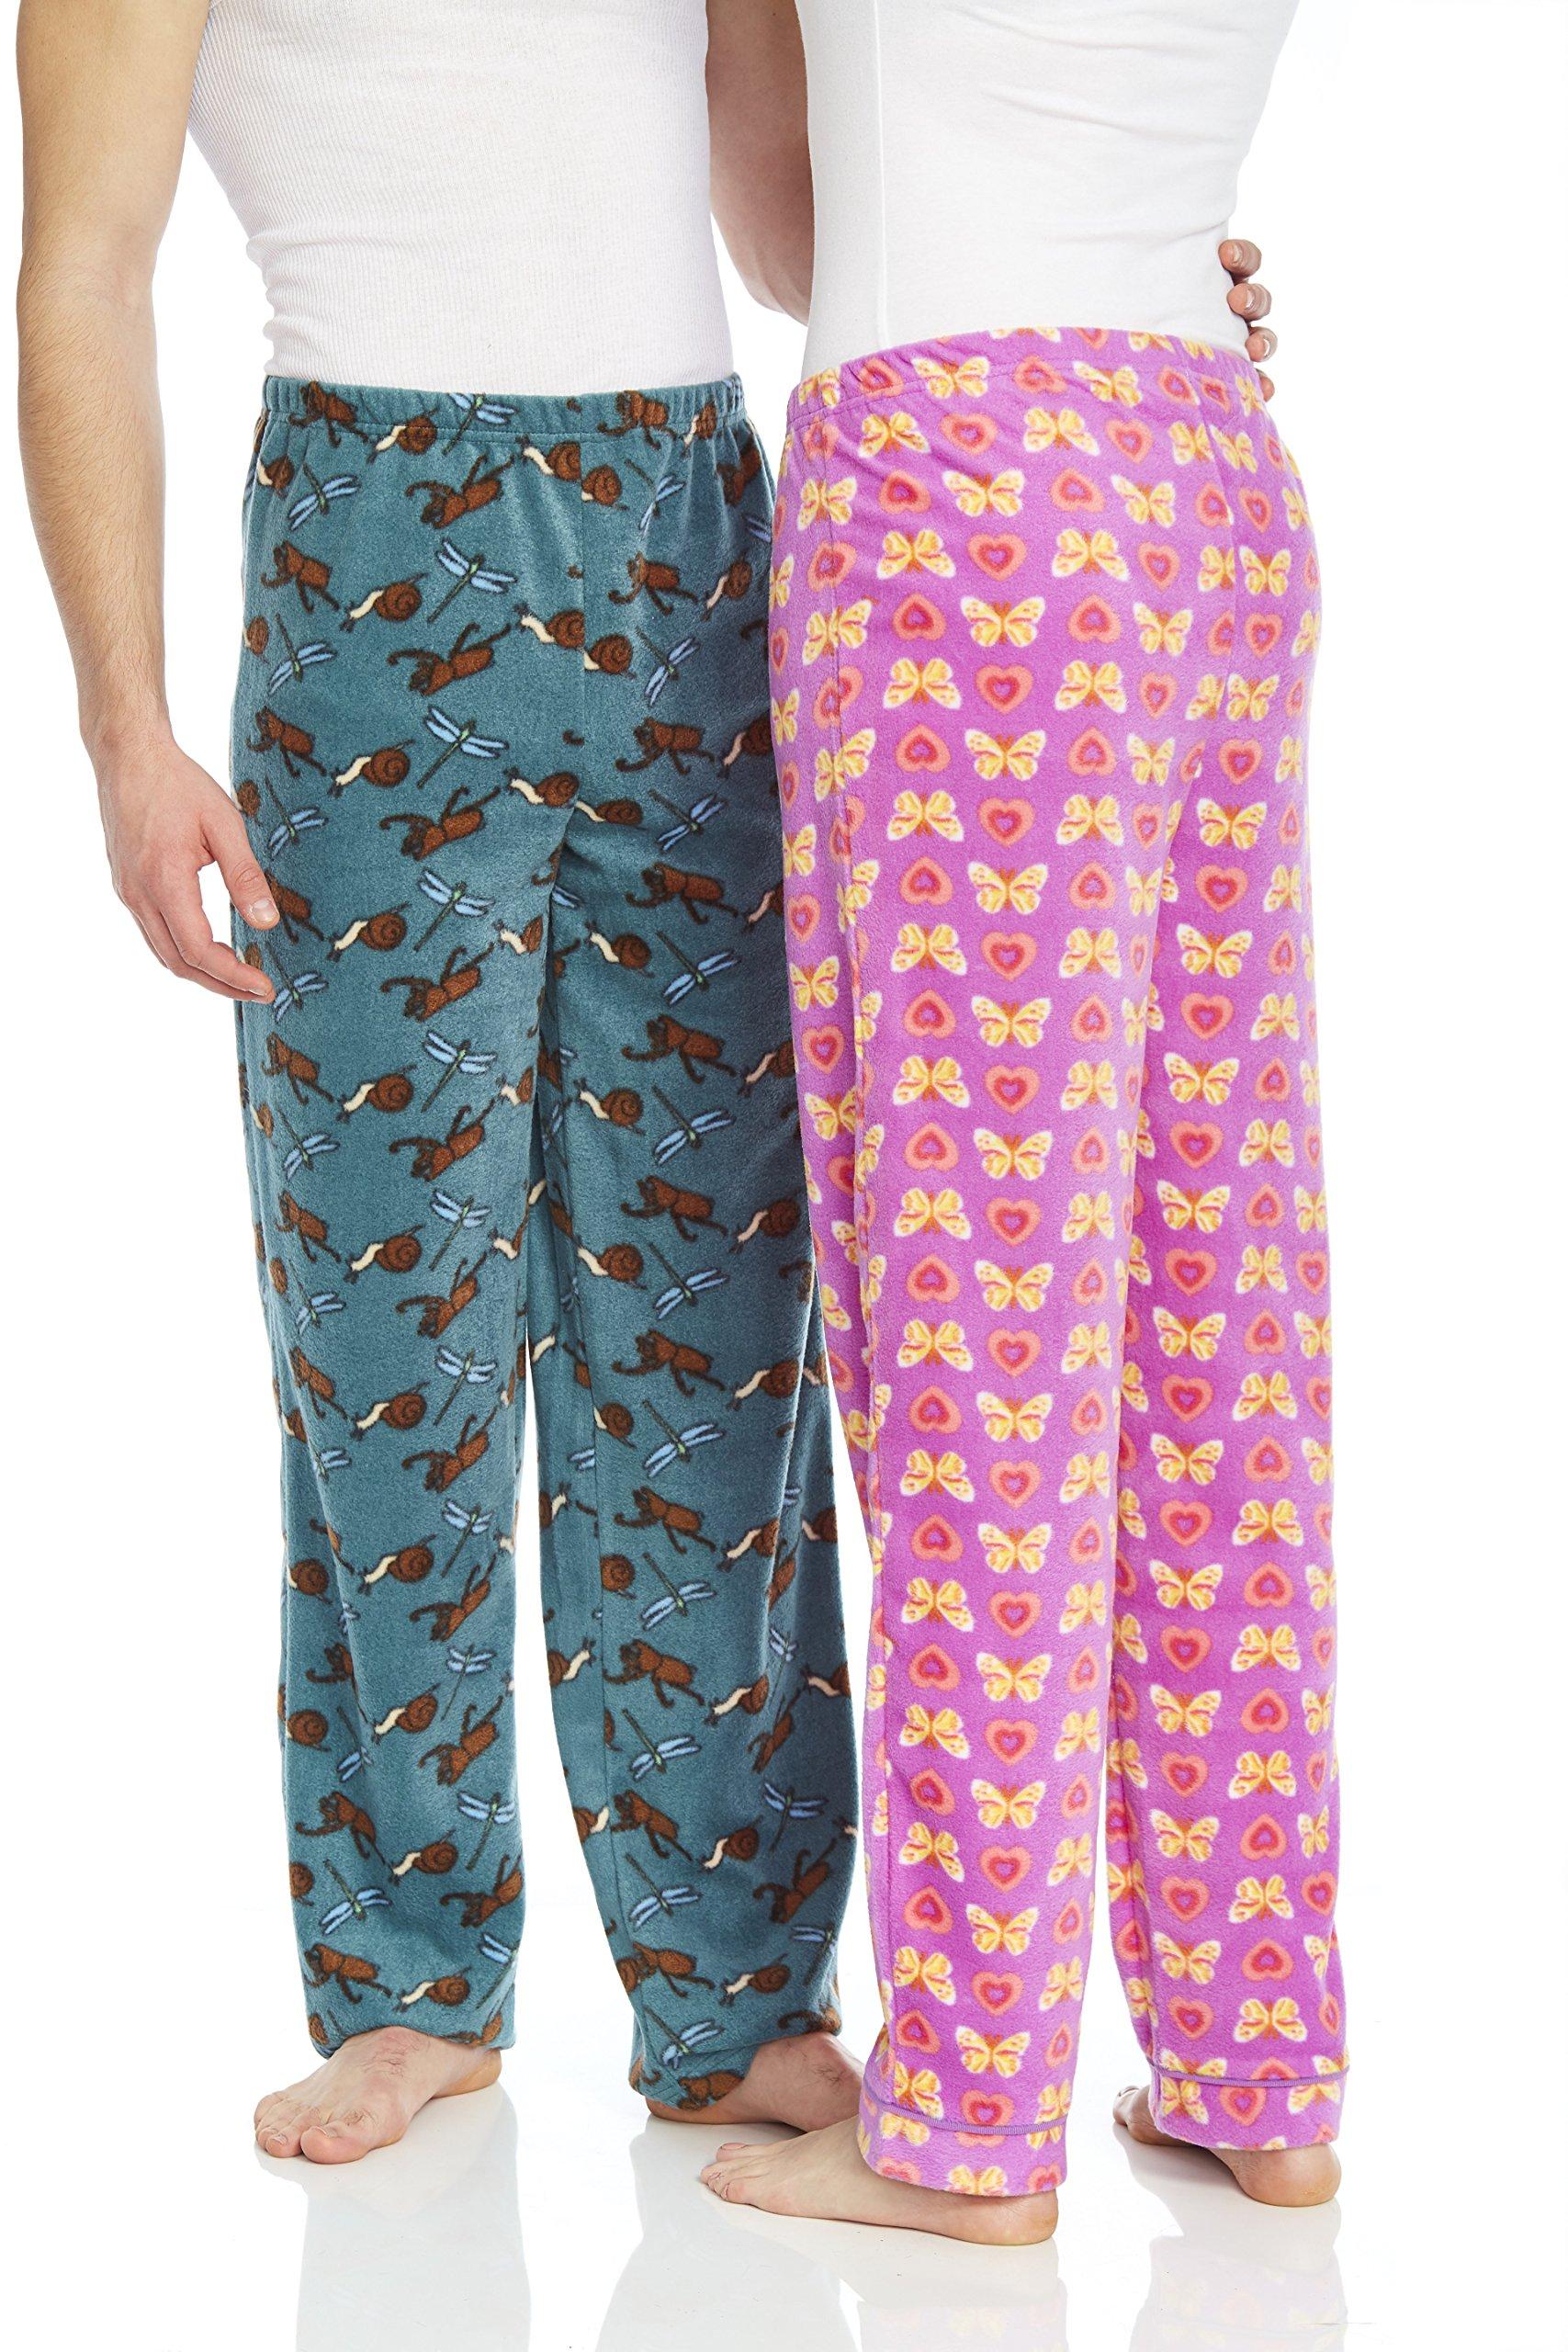 Corona Extra 25 Lounge Pants Sleep Pajamas Bottoms Size S for sale online |  eBay